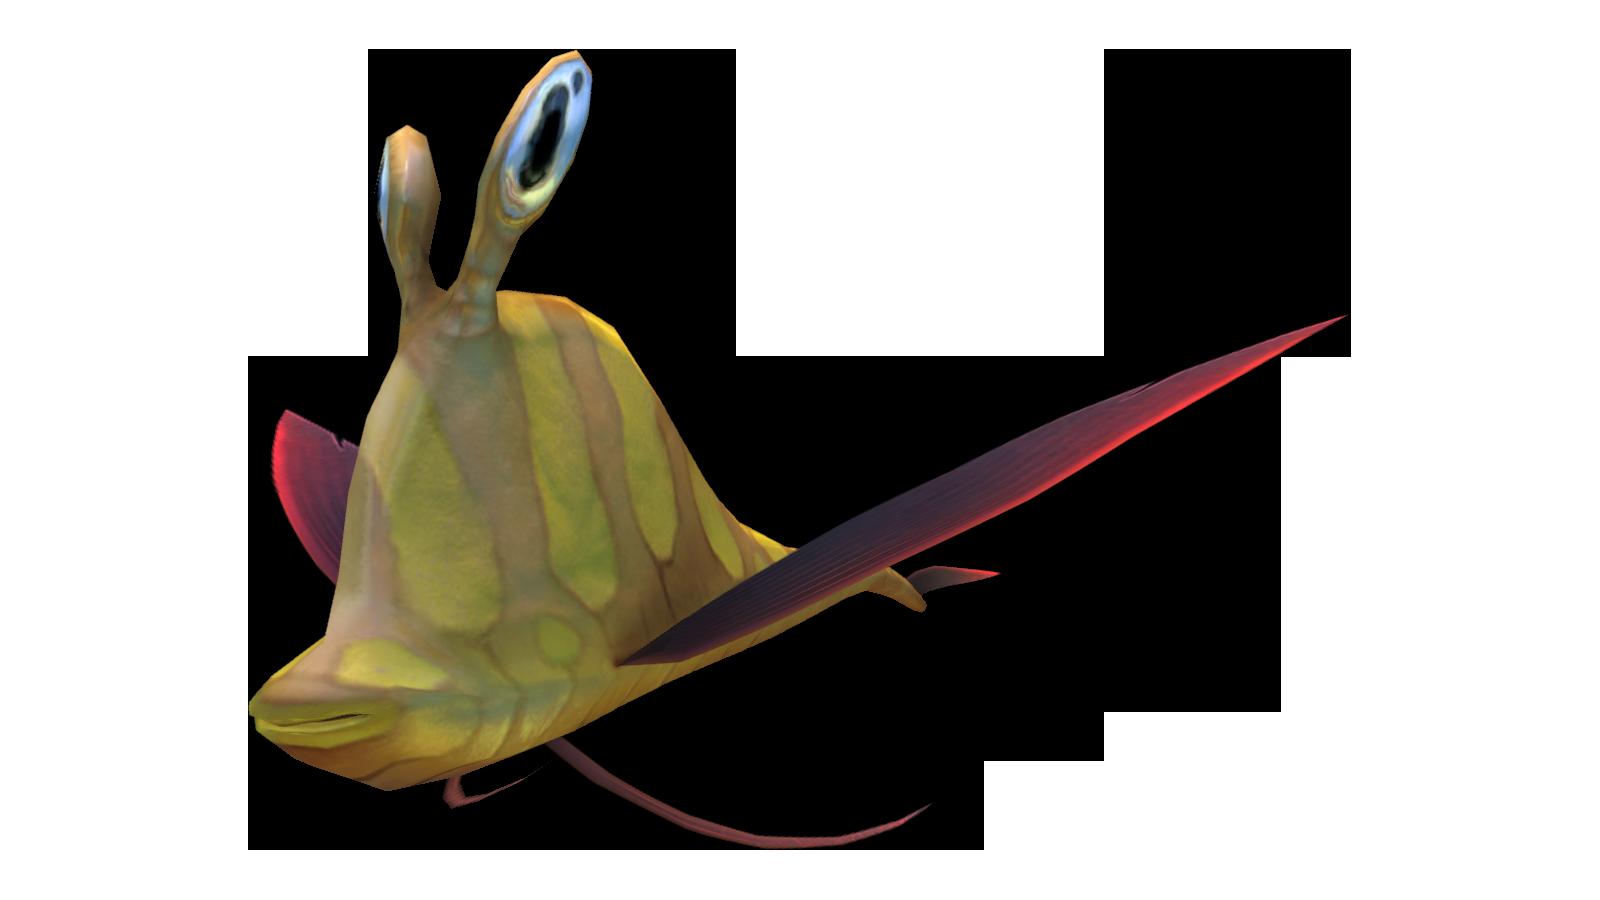 Garryfish | Subnautica Wiki | FANDOM powered by Wikia